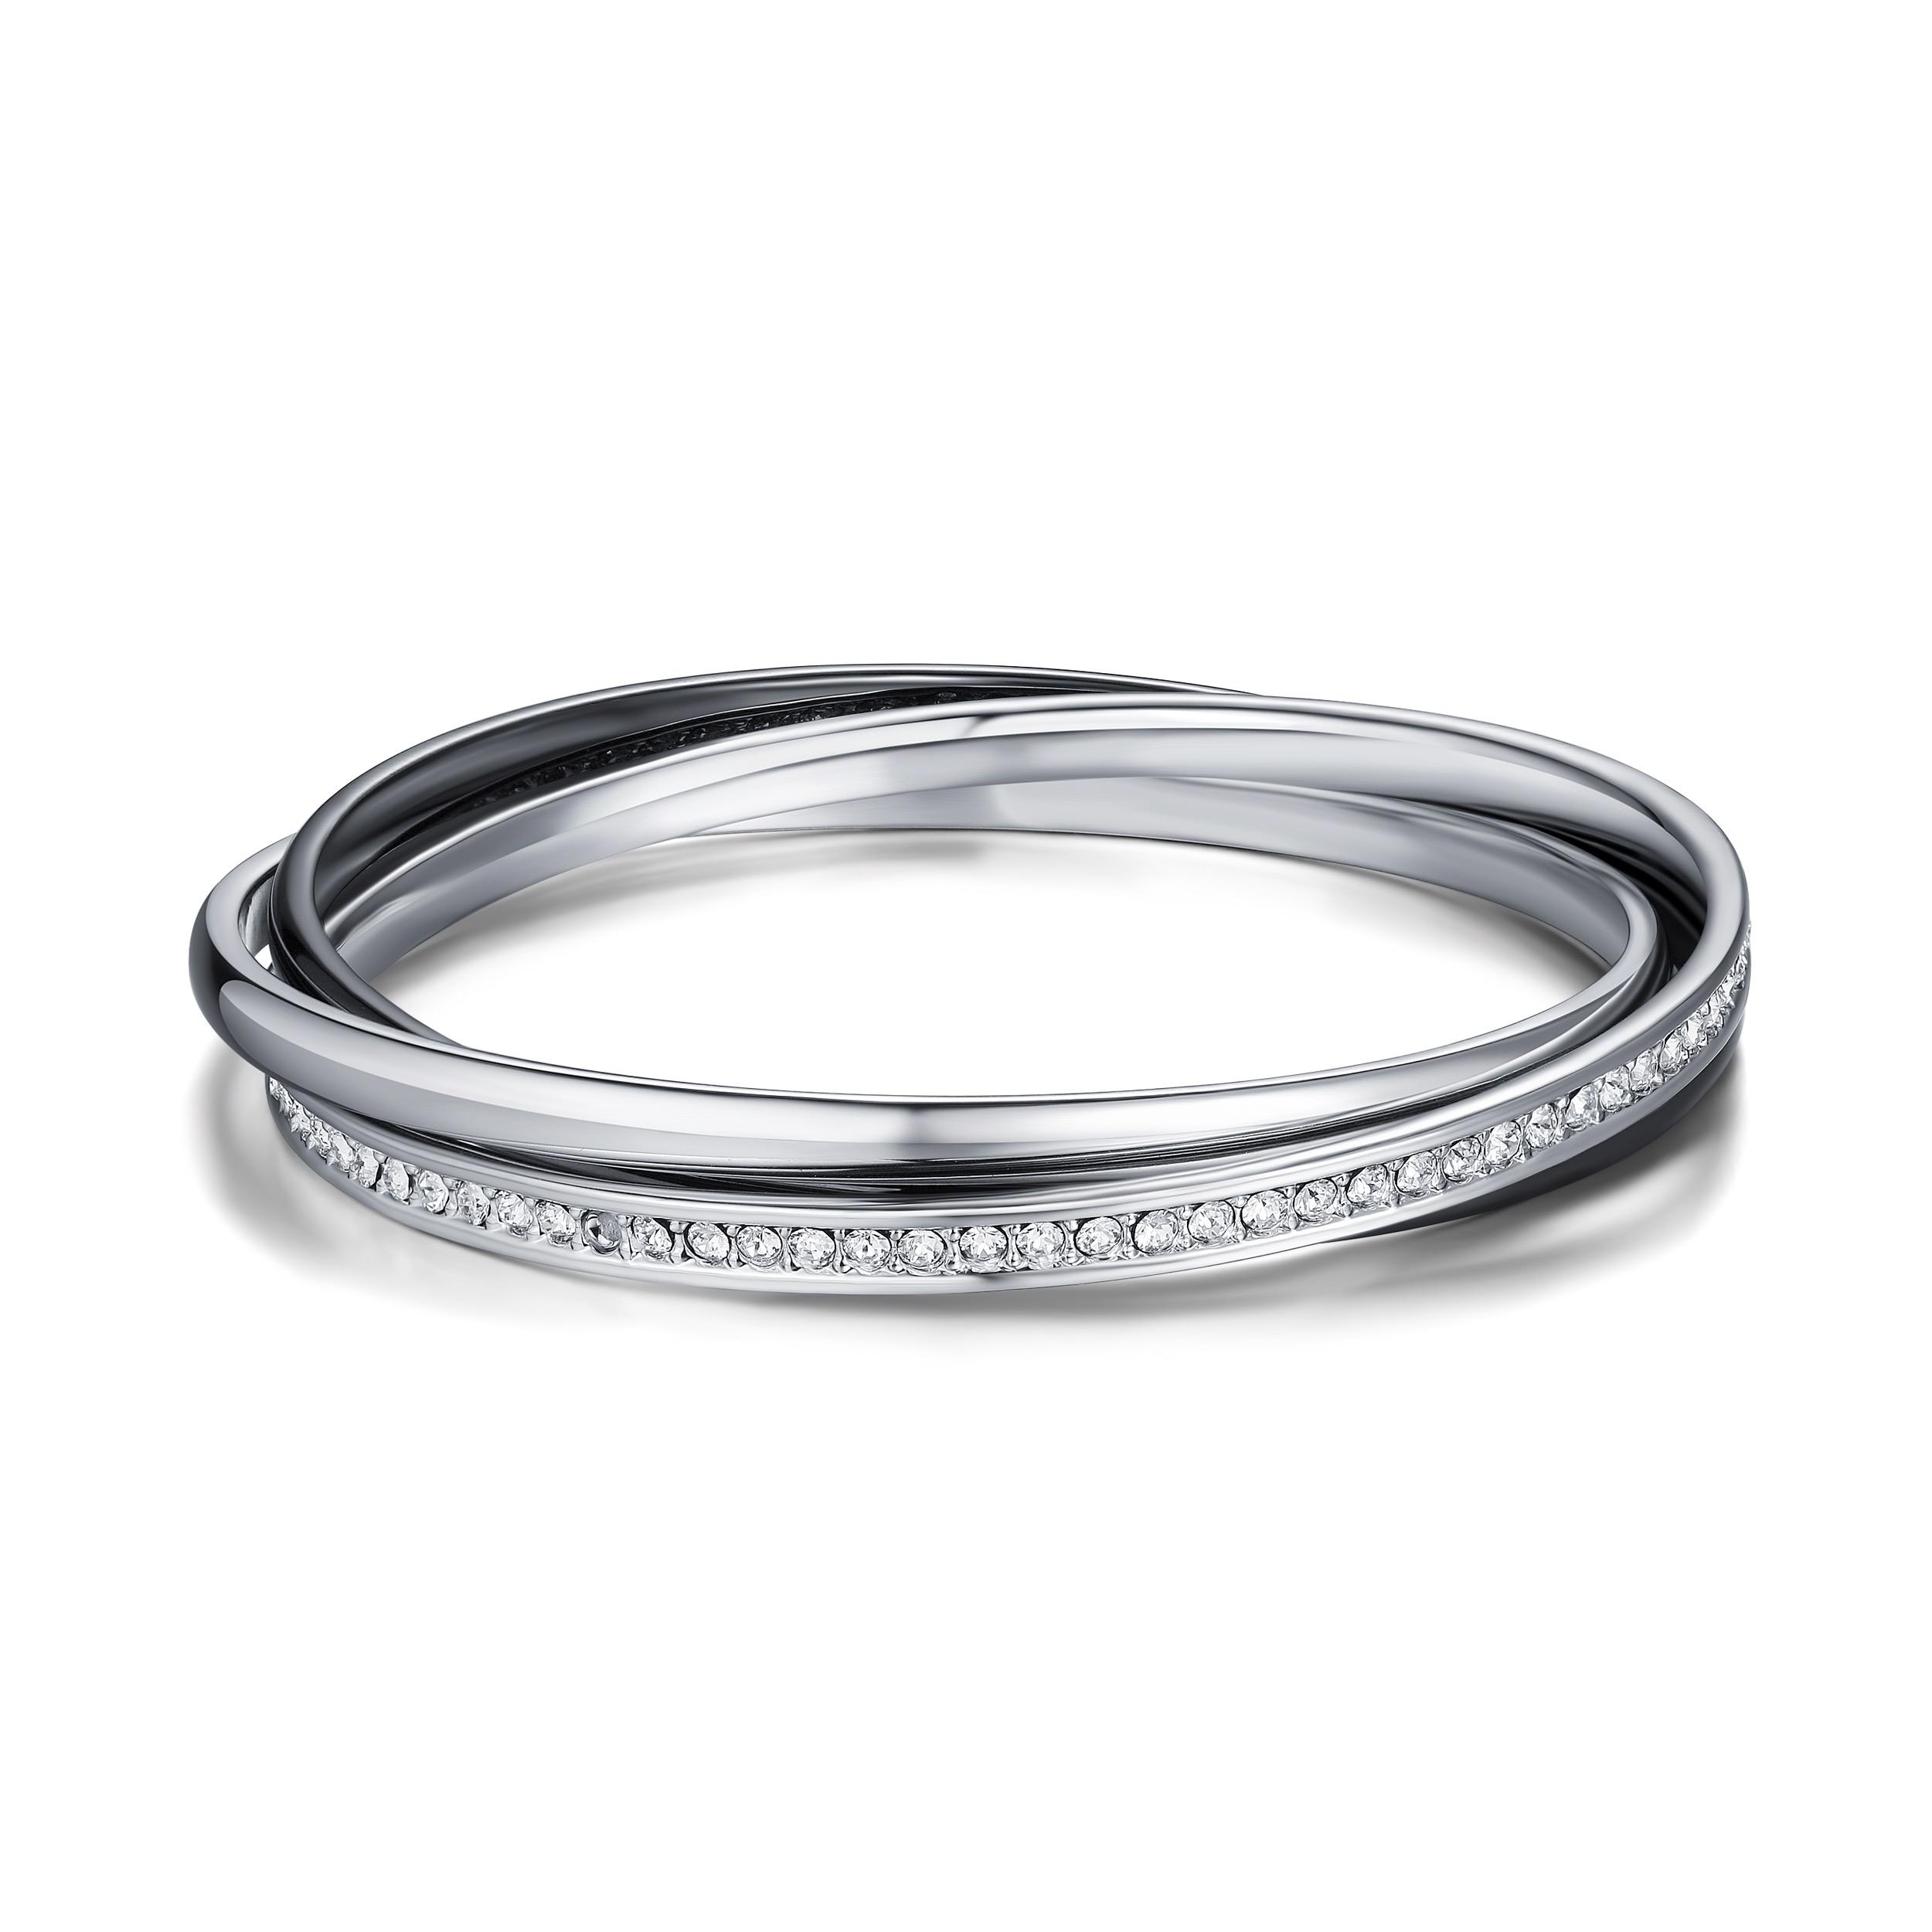 f954ff8c7d8f Details about MYJS Trinity Bracelet Bangle with Swarovski Crystals Rhodium  Gun Metal Pltd Gift